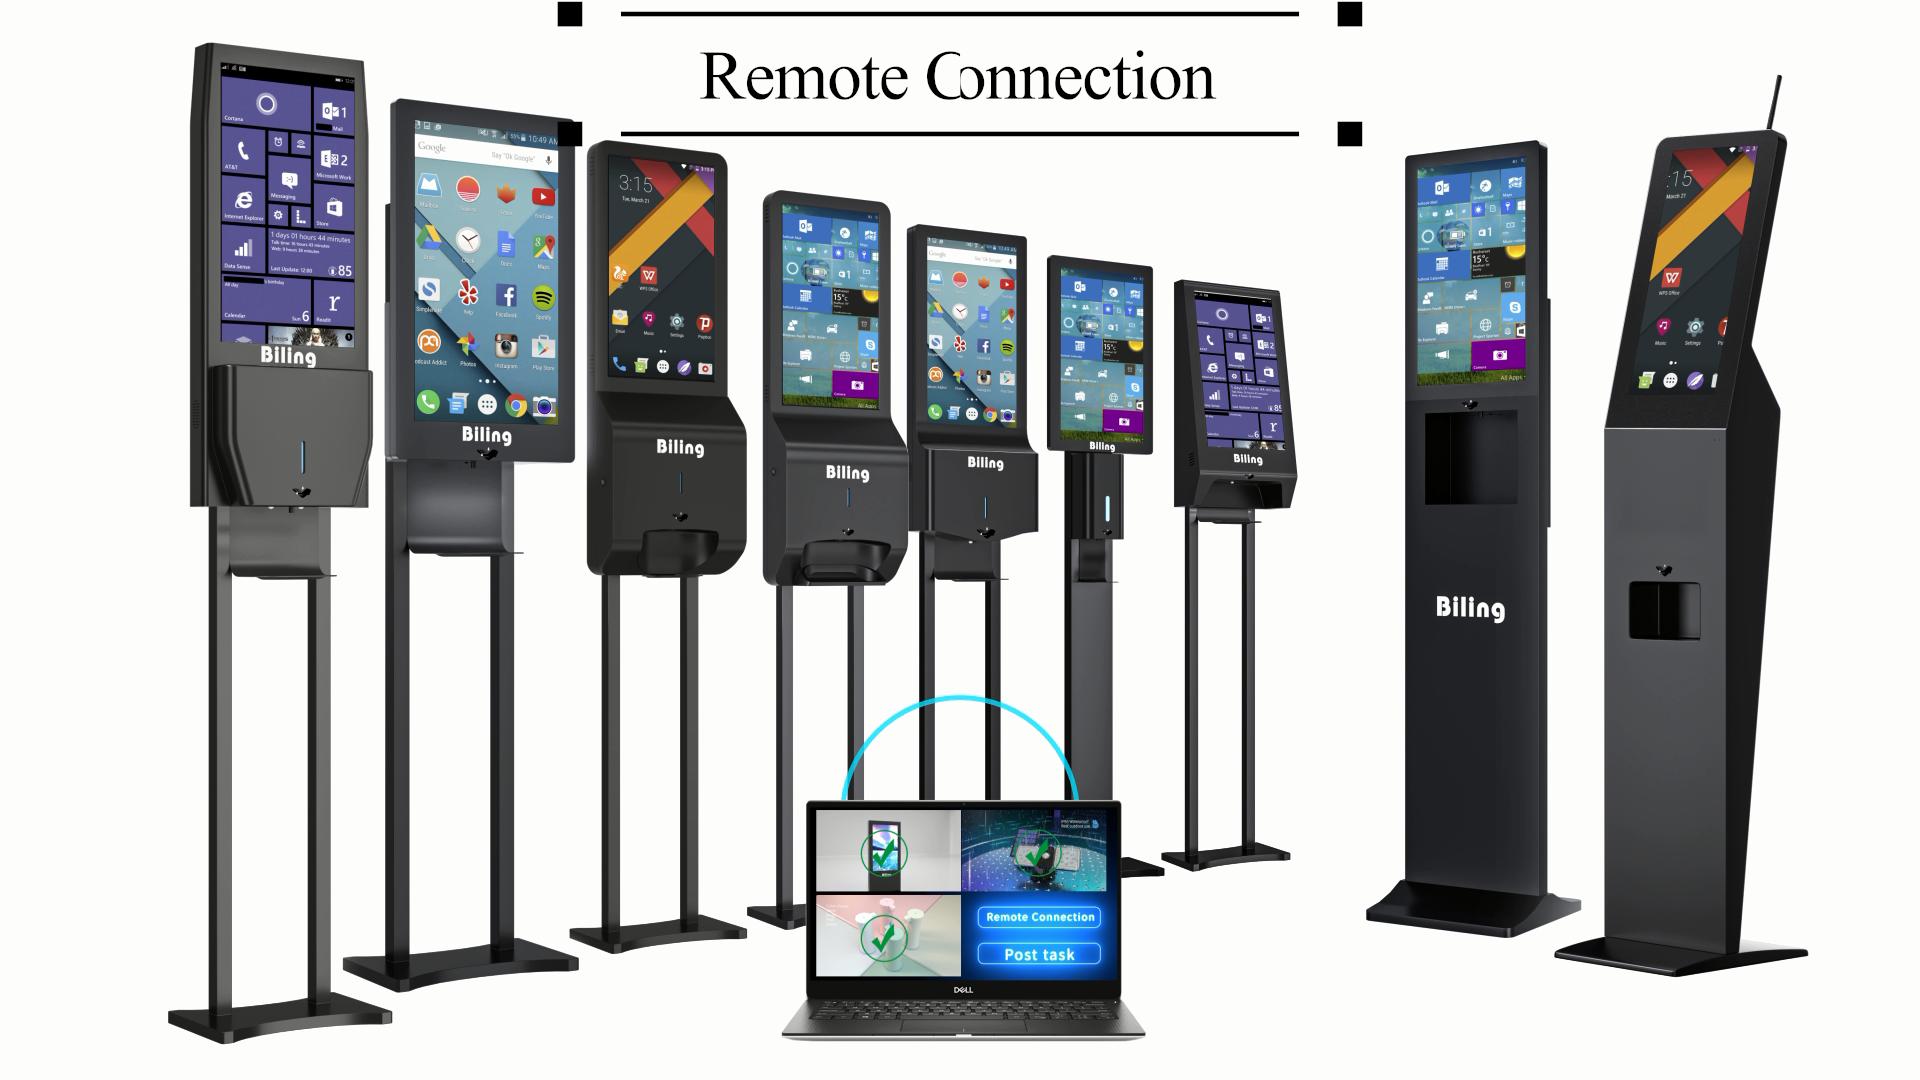 Advertizing Kiosk Advertising Display Digital Signage With Hand Sanitizer